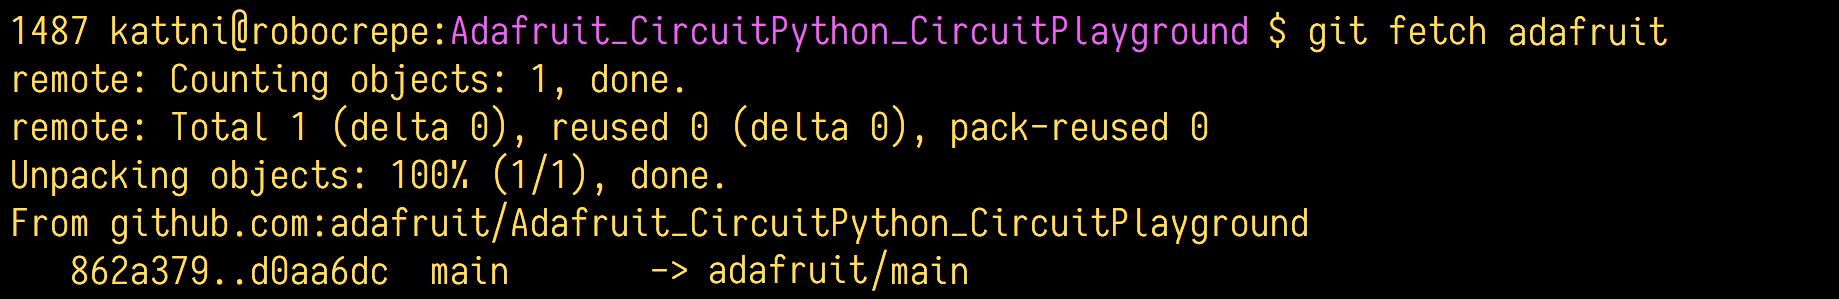 circuitpython_GitUpdateFetchAdafruitMain.png